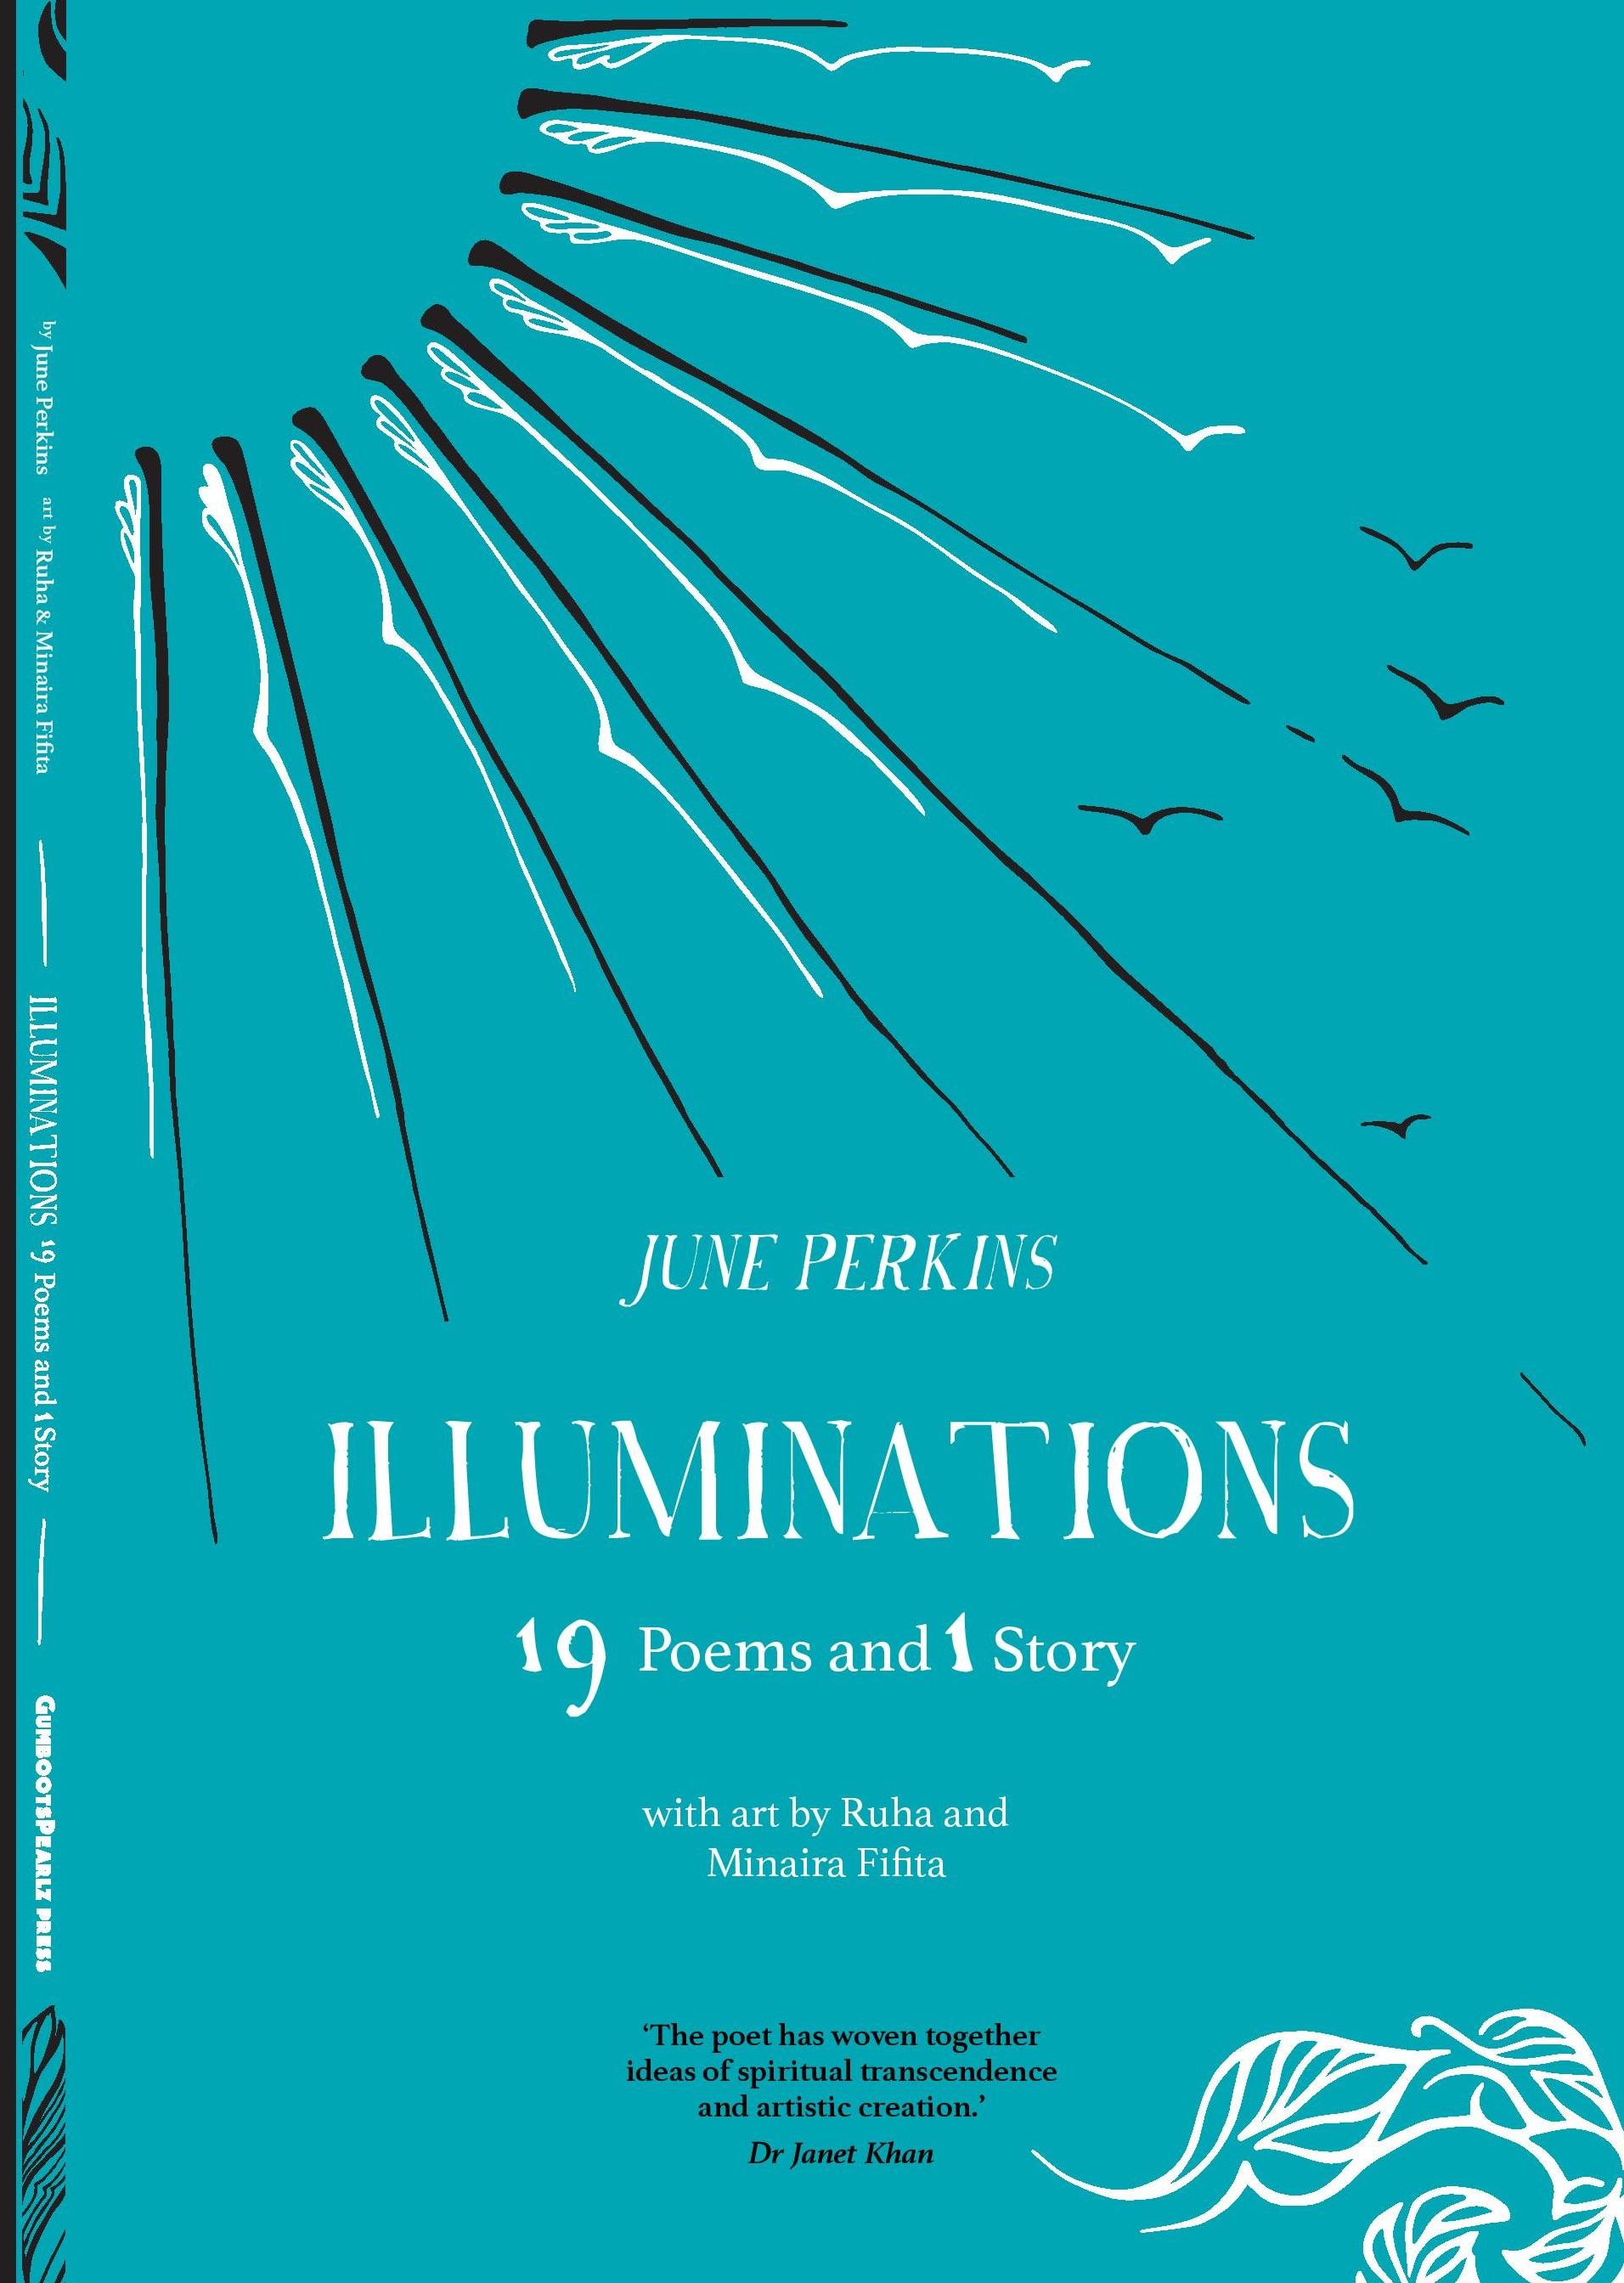 Illuminationsfrontcover